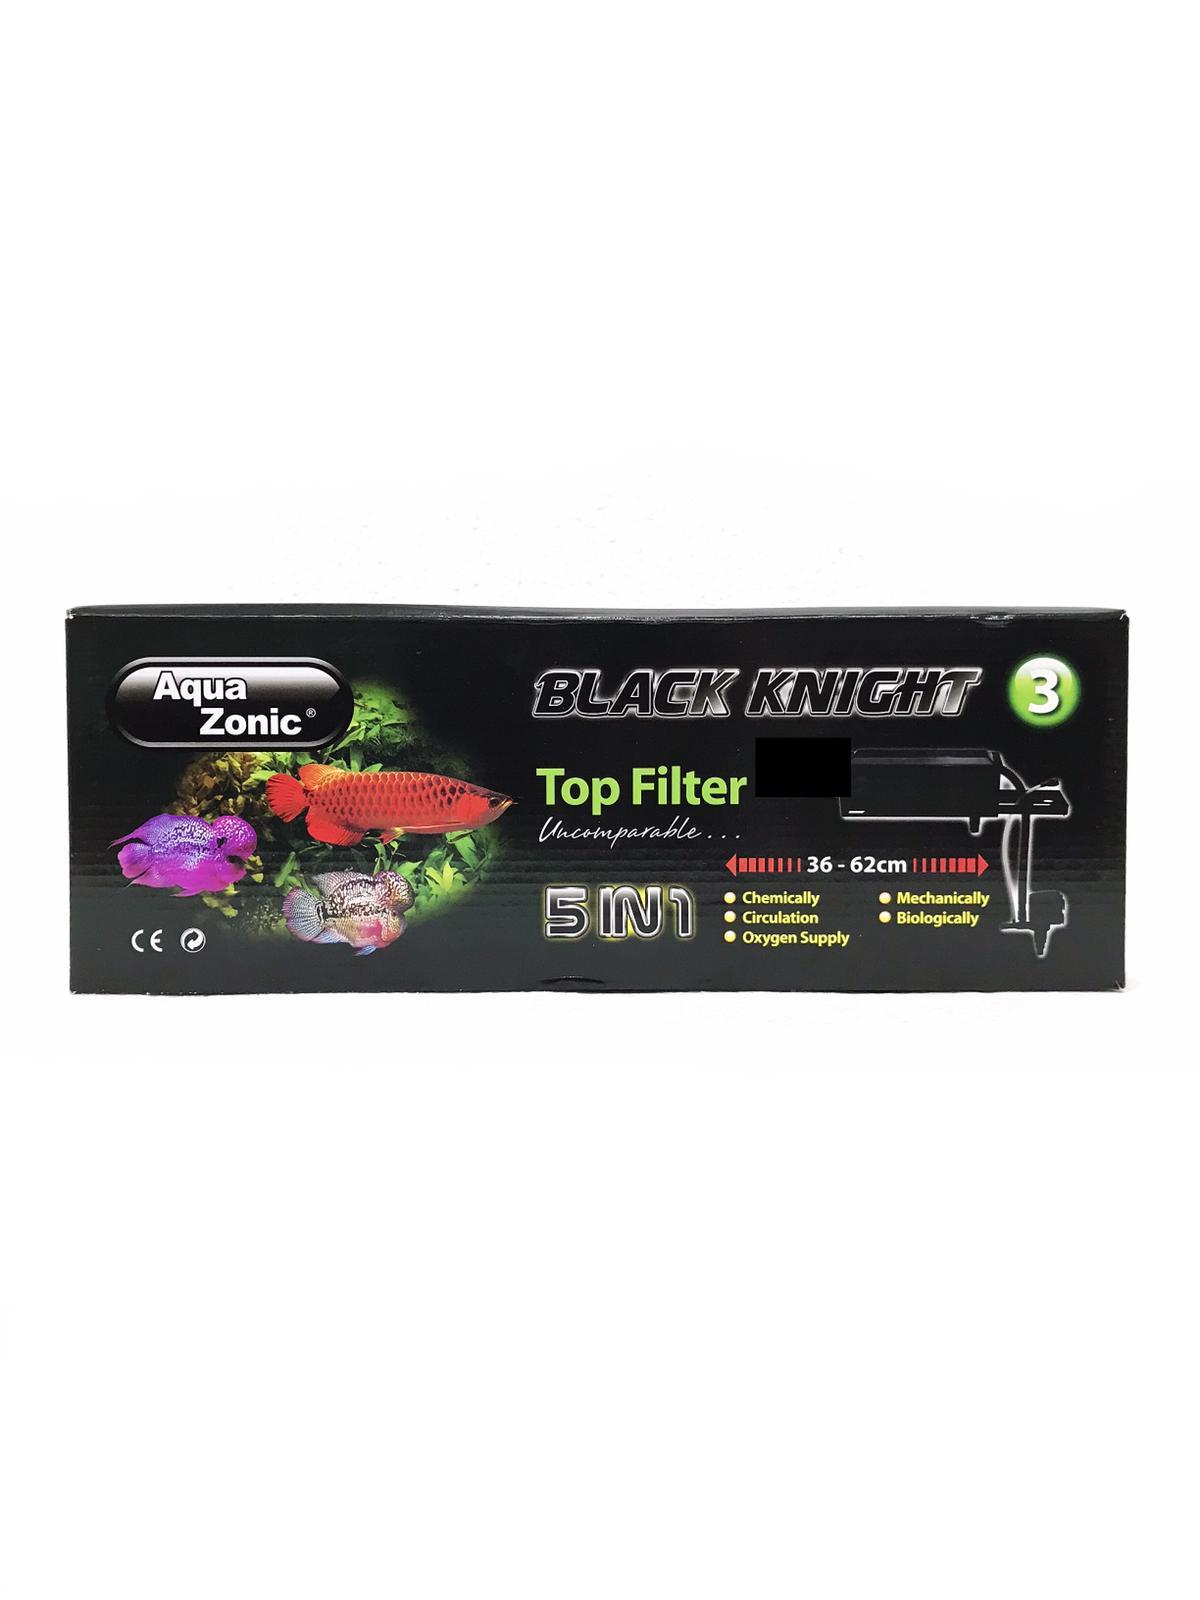 Aqua Zonic Black Knight Top Filter